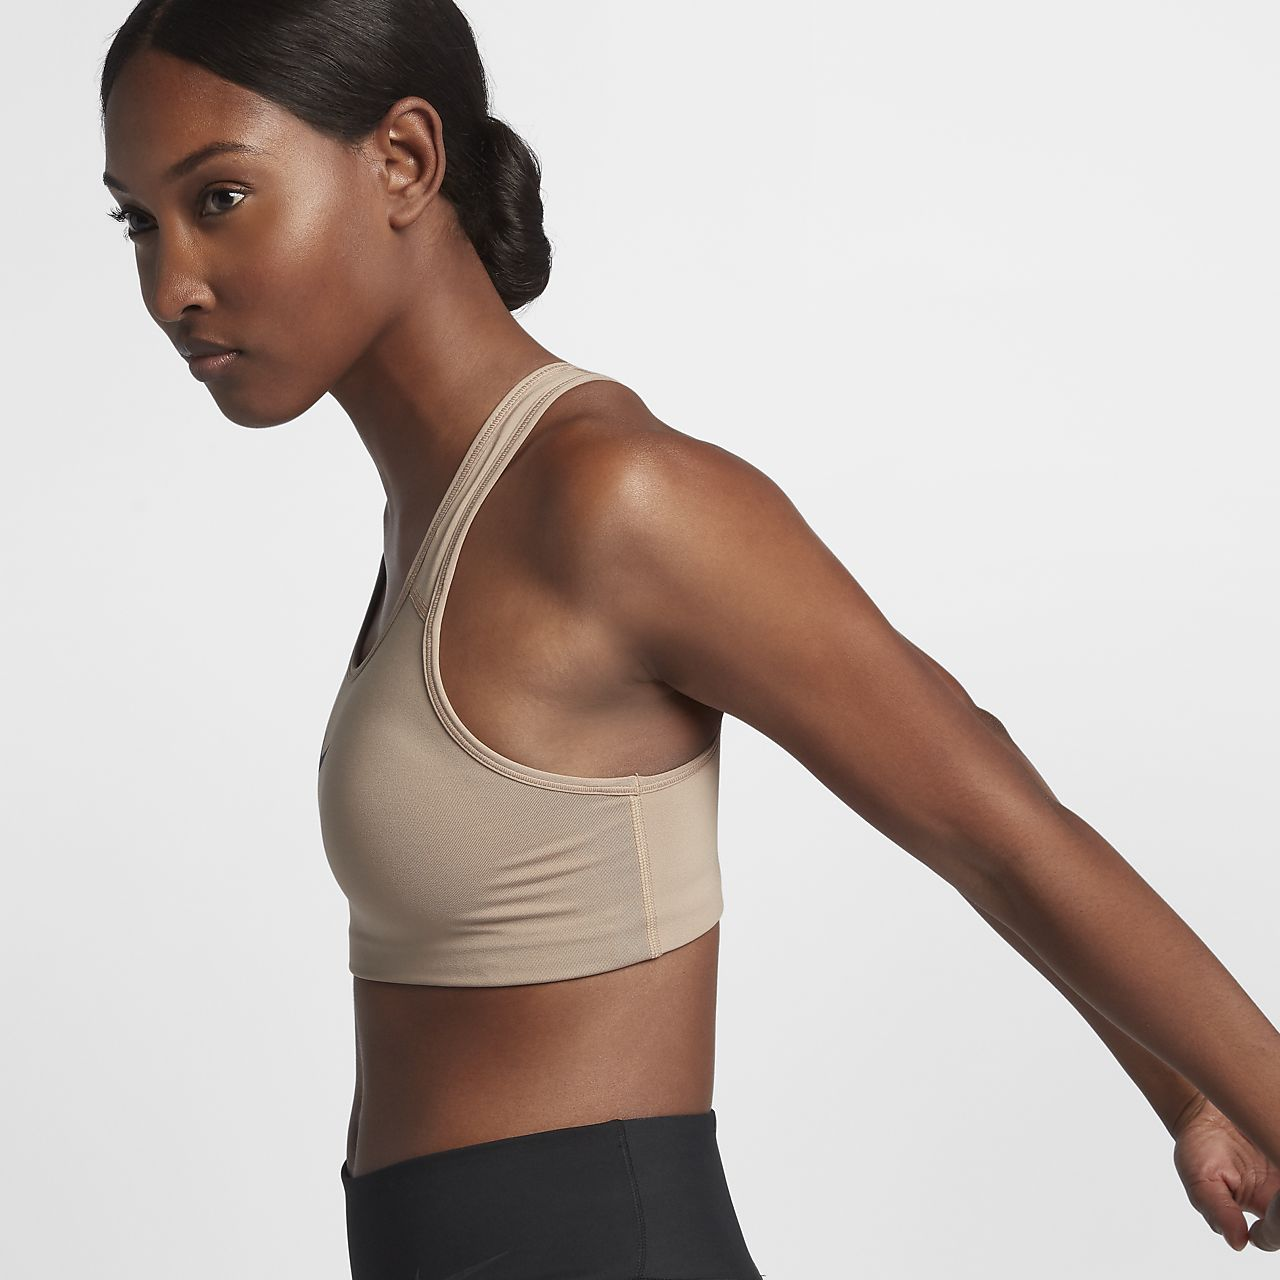 ... Nike Classic Swoosh Women's Medium Support Sports Bra